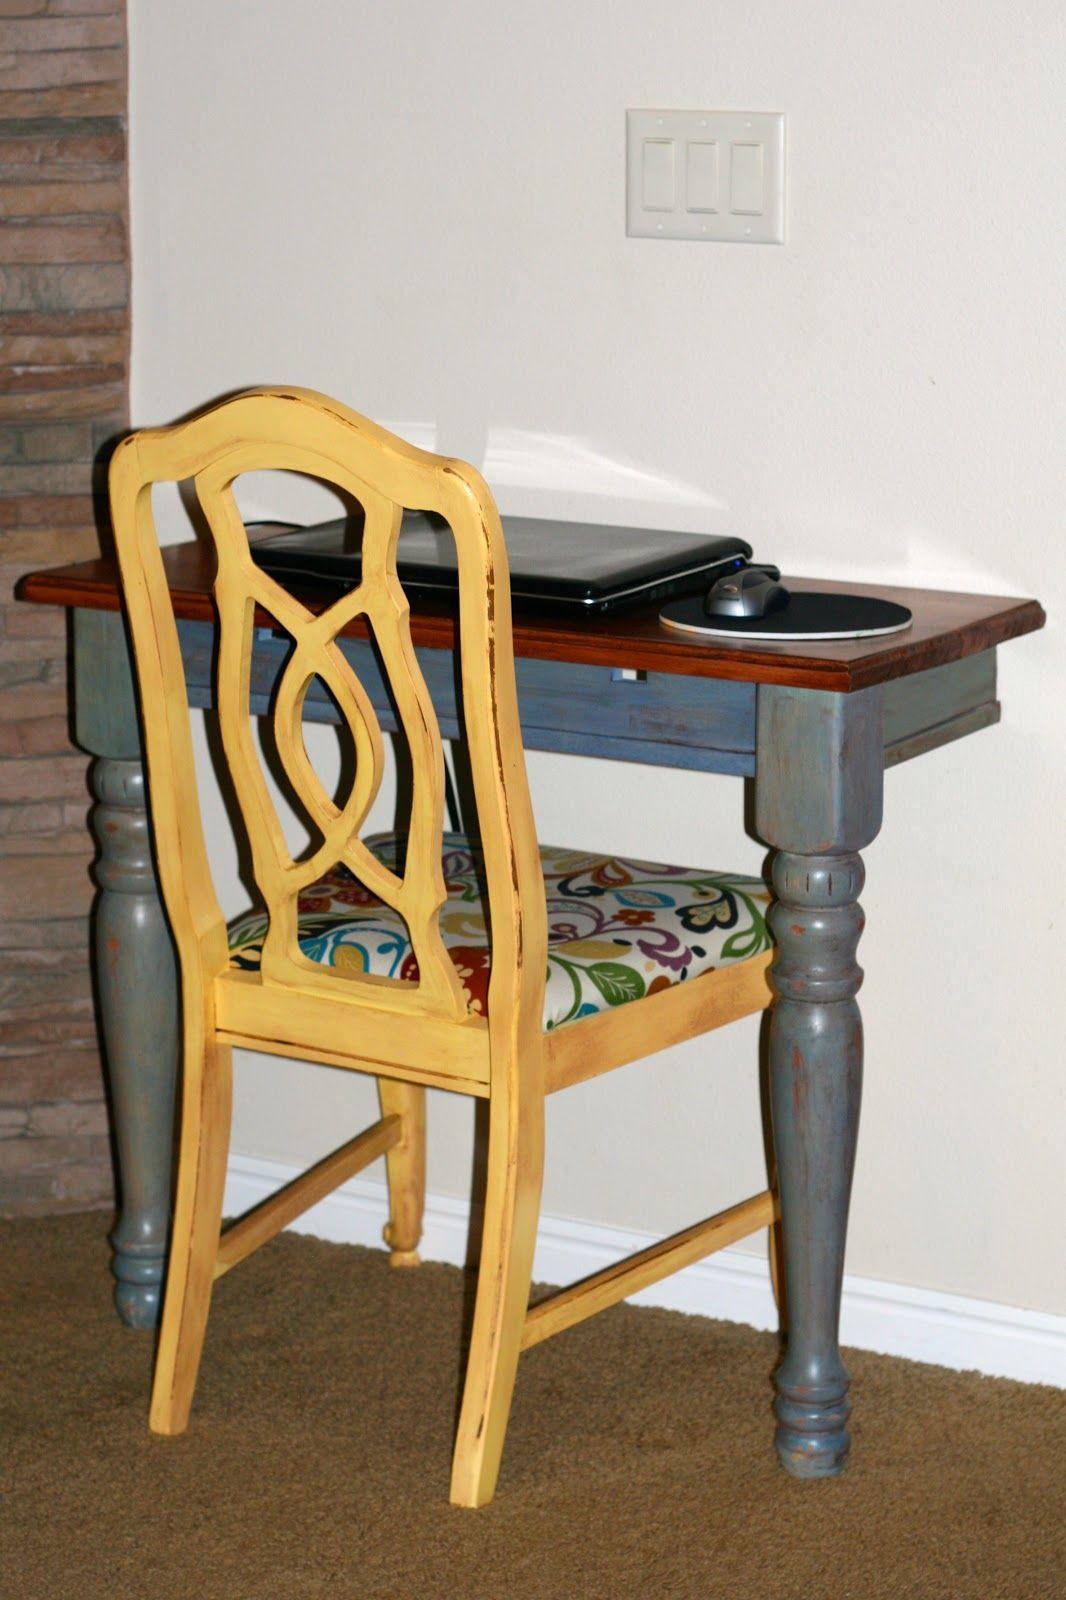 Larcie bird half table repurposed furniture yellow and grey